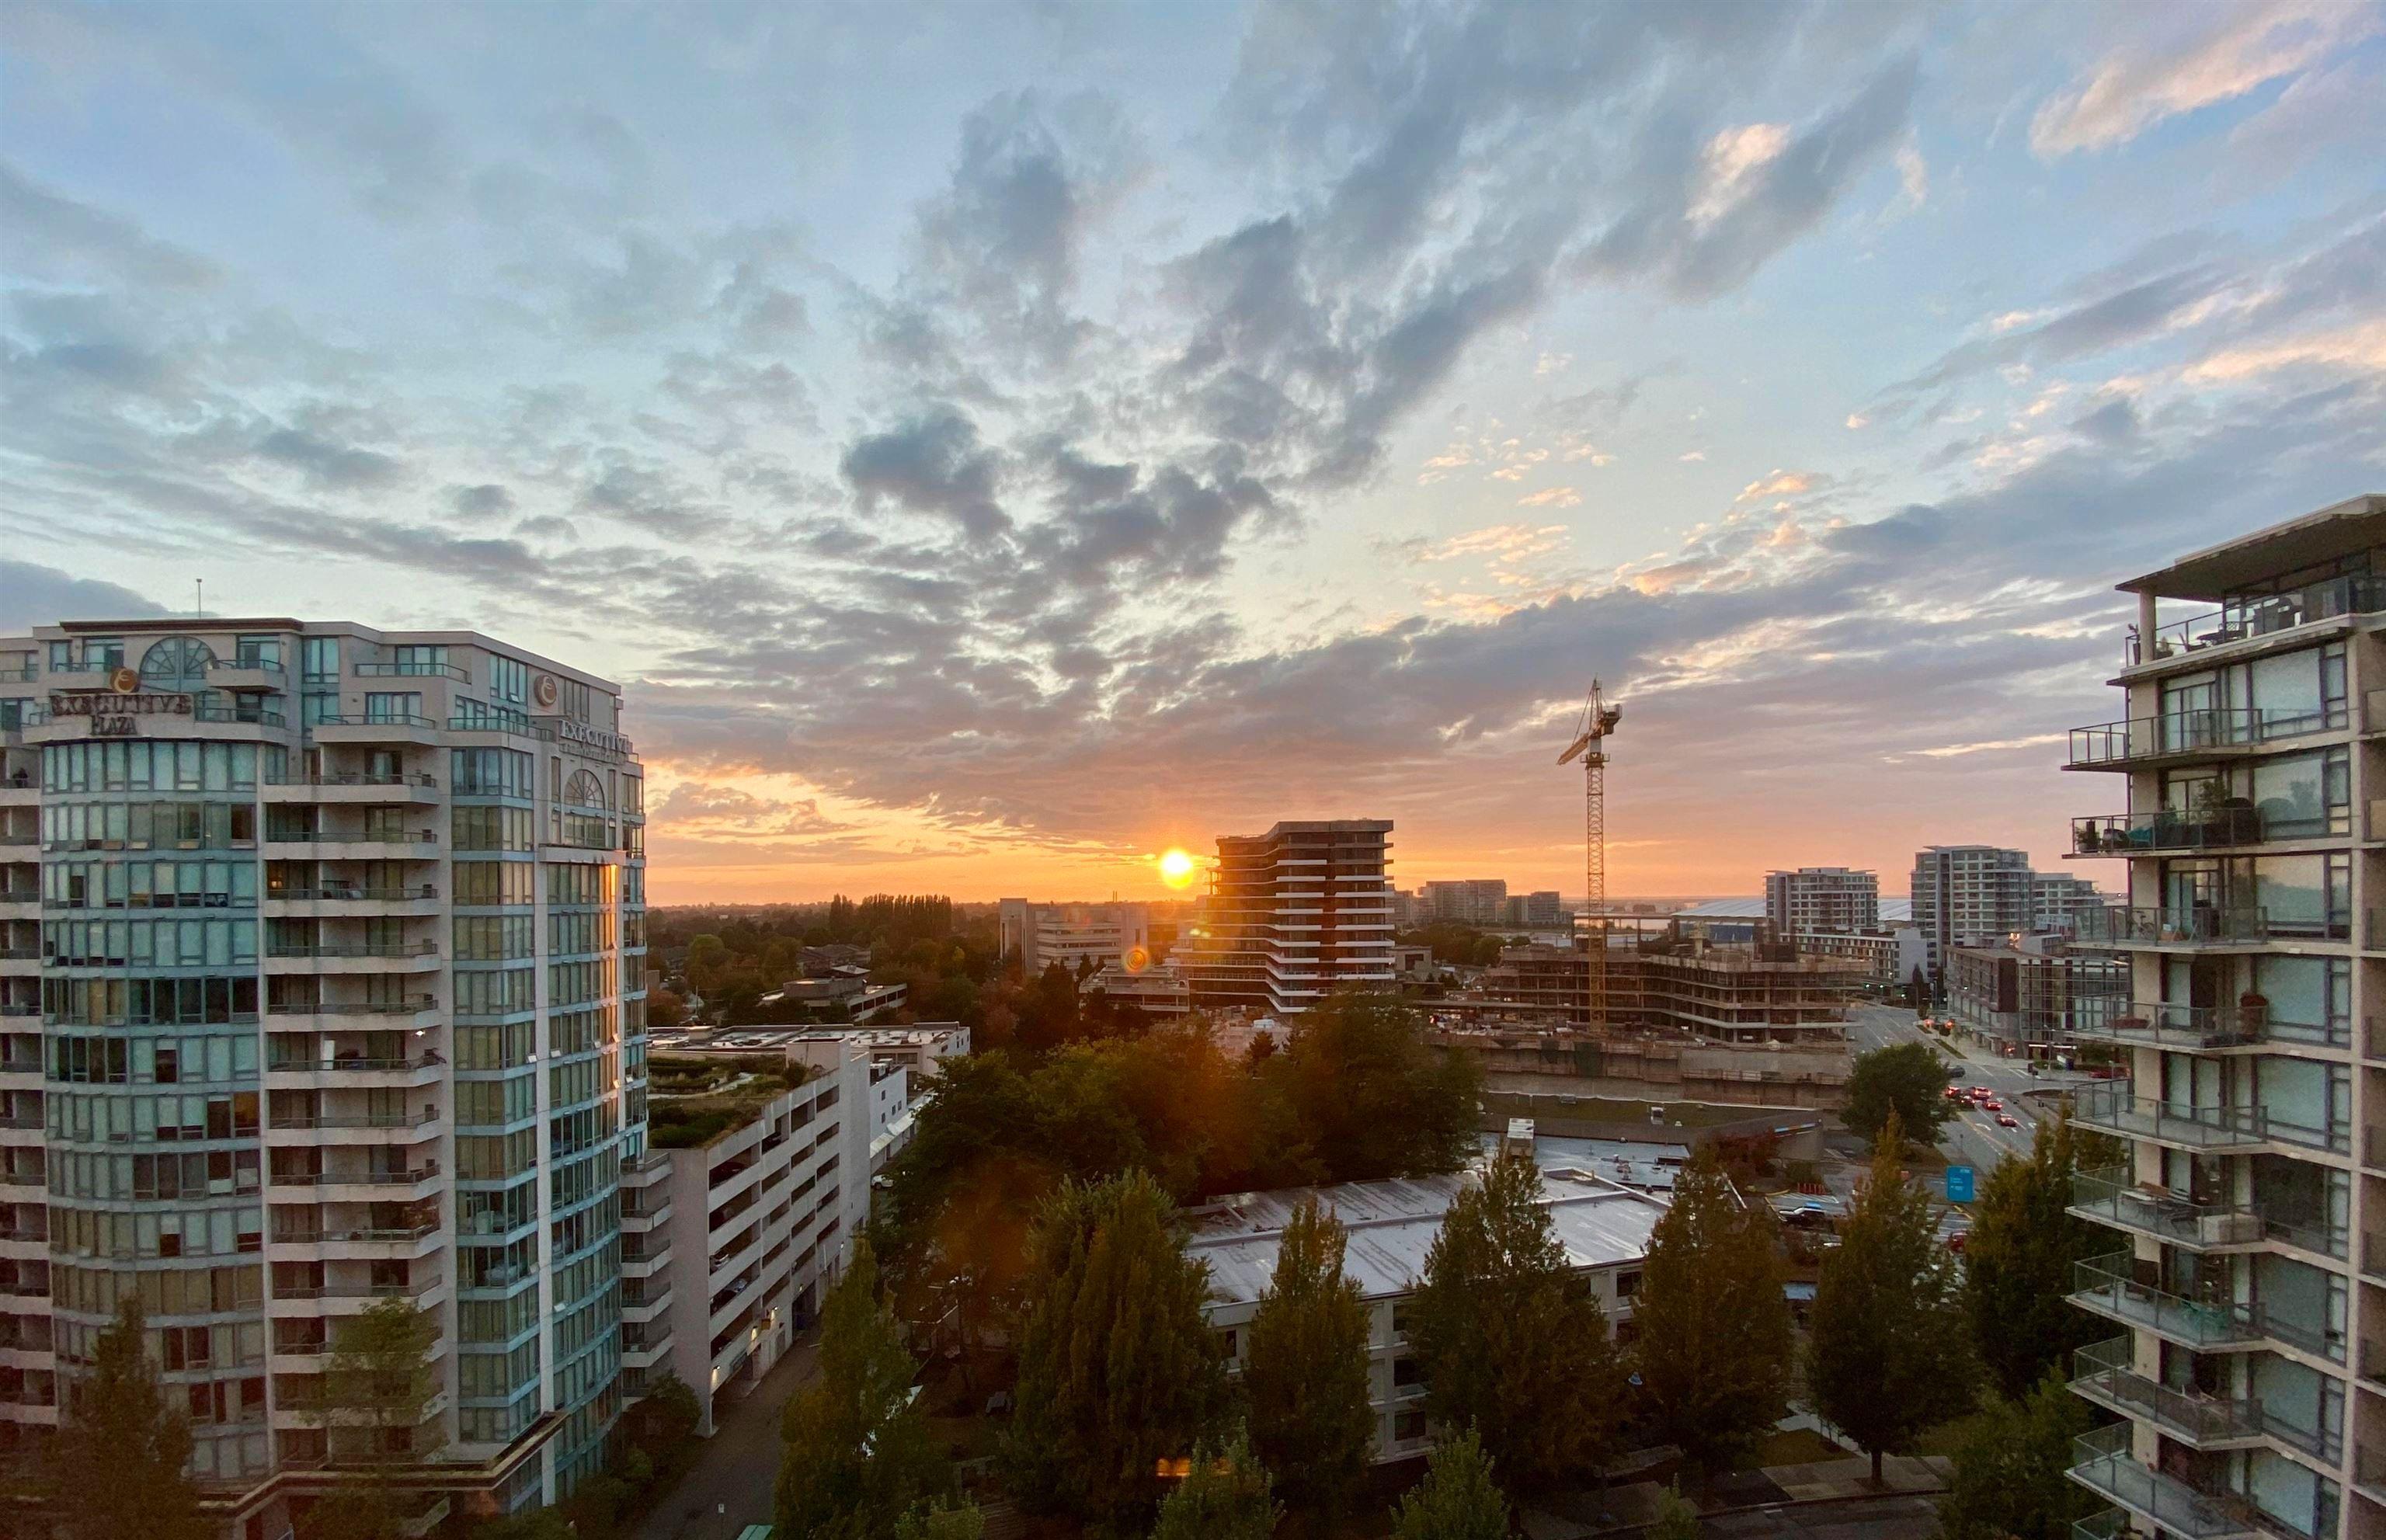 Main Photo: 1507 6888 ALDERBRIDGE WAY in Richmond: Brighouse Condo for sale : MLS®# R2614373